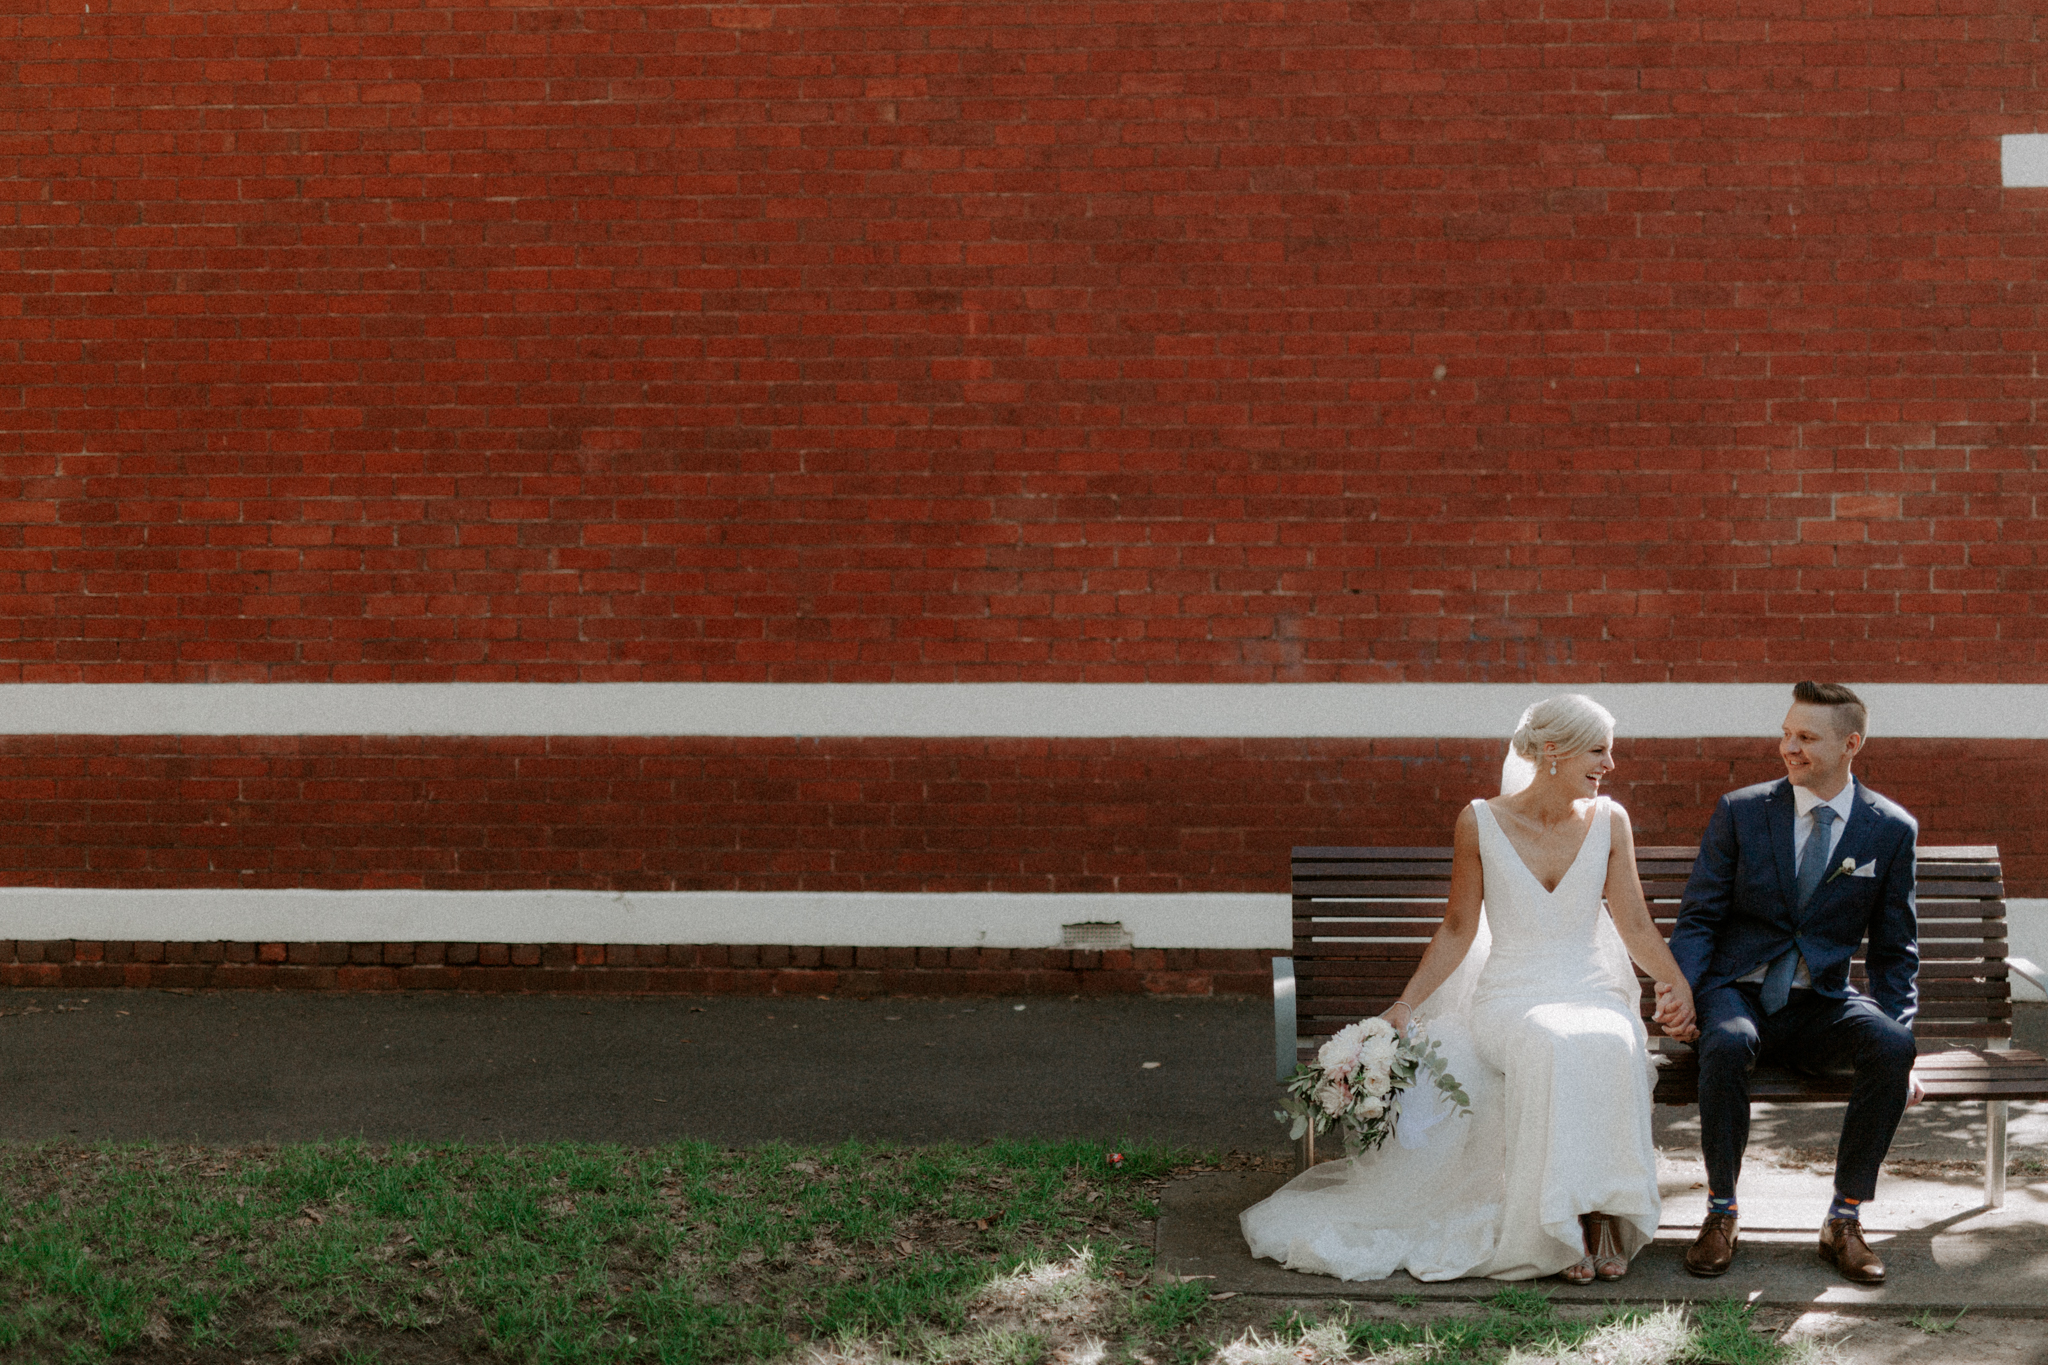 St-Kilda-Garden-Wedding-Emotions-and-Math-Photograph-114.jpg